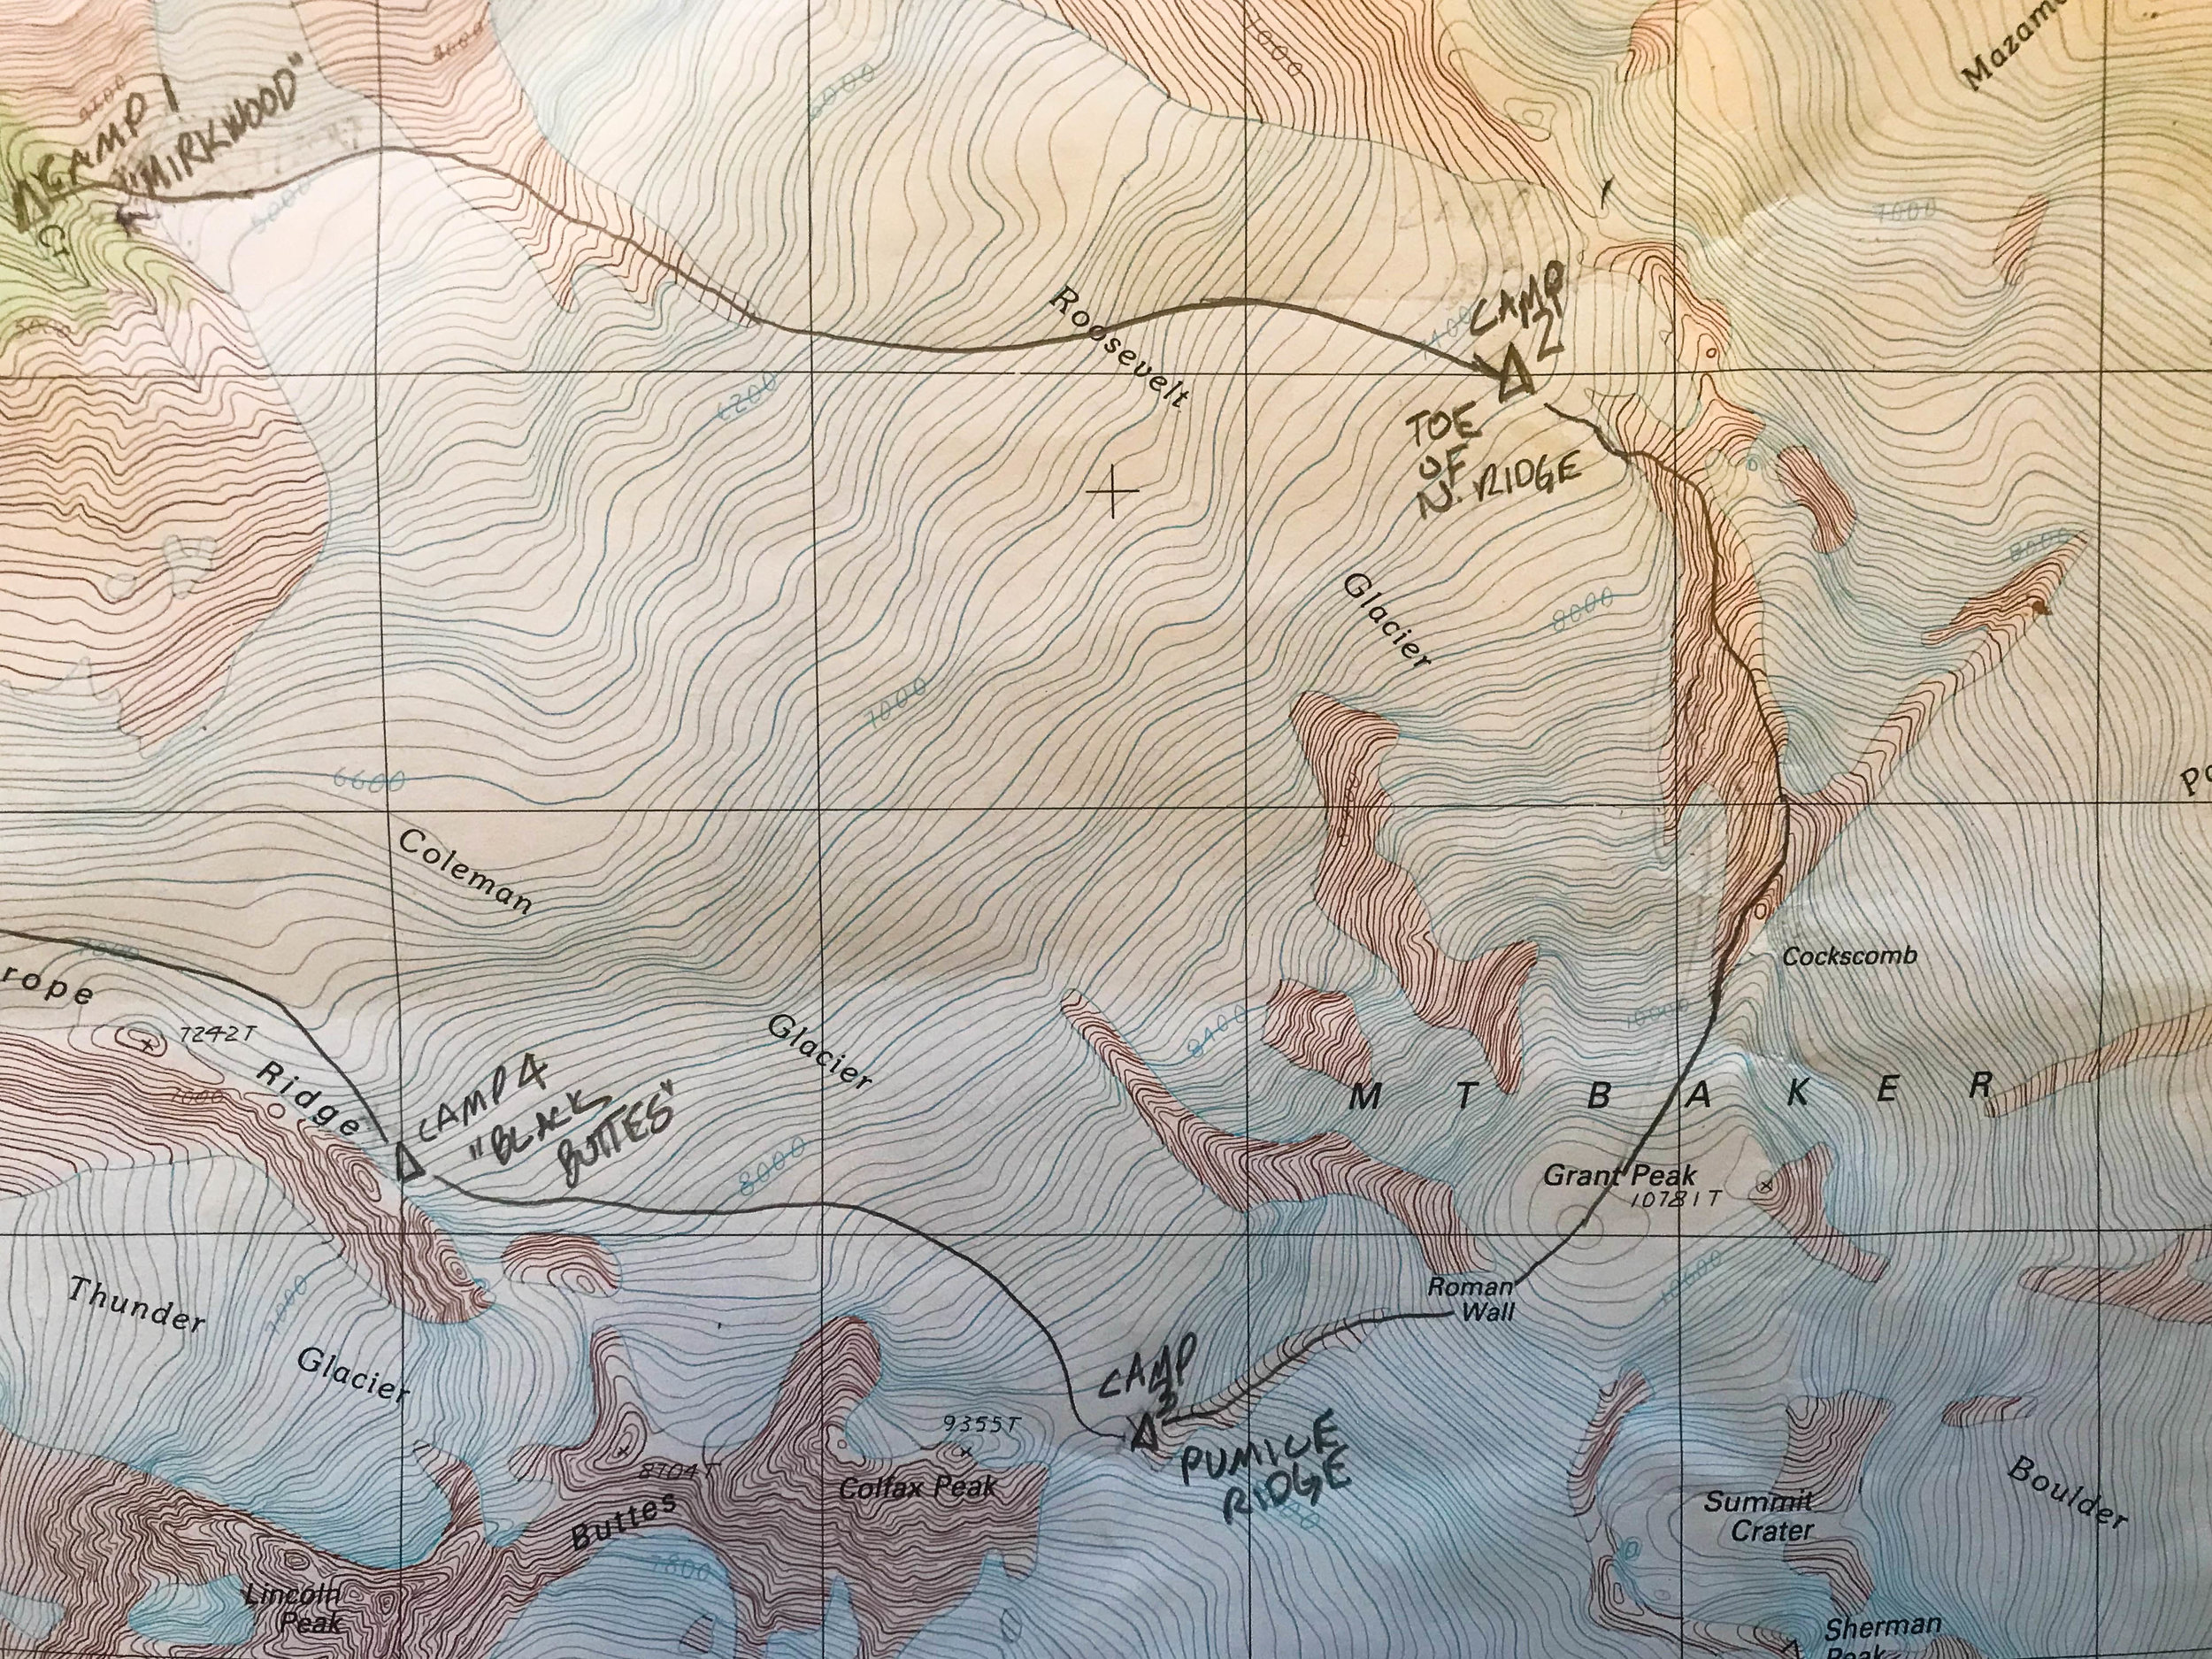 north-ridge-route-map.jpg